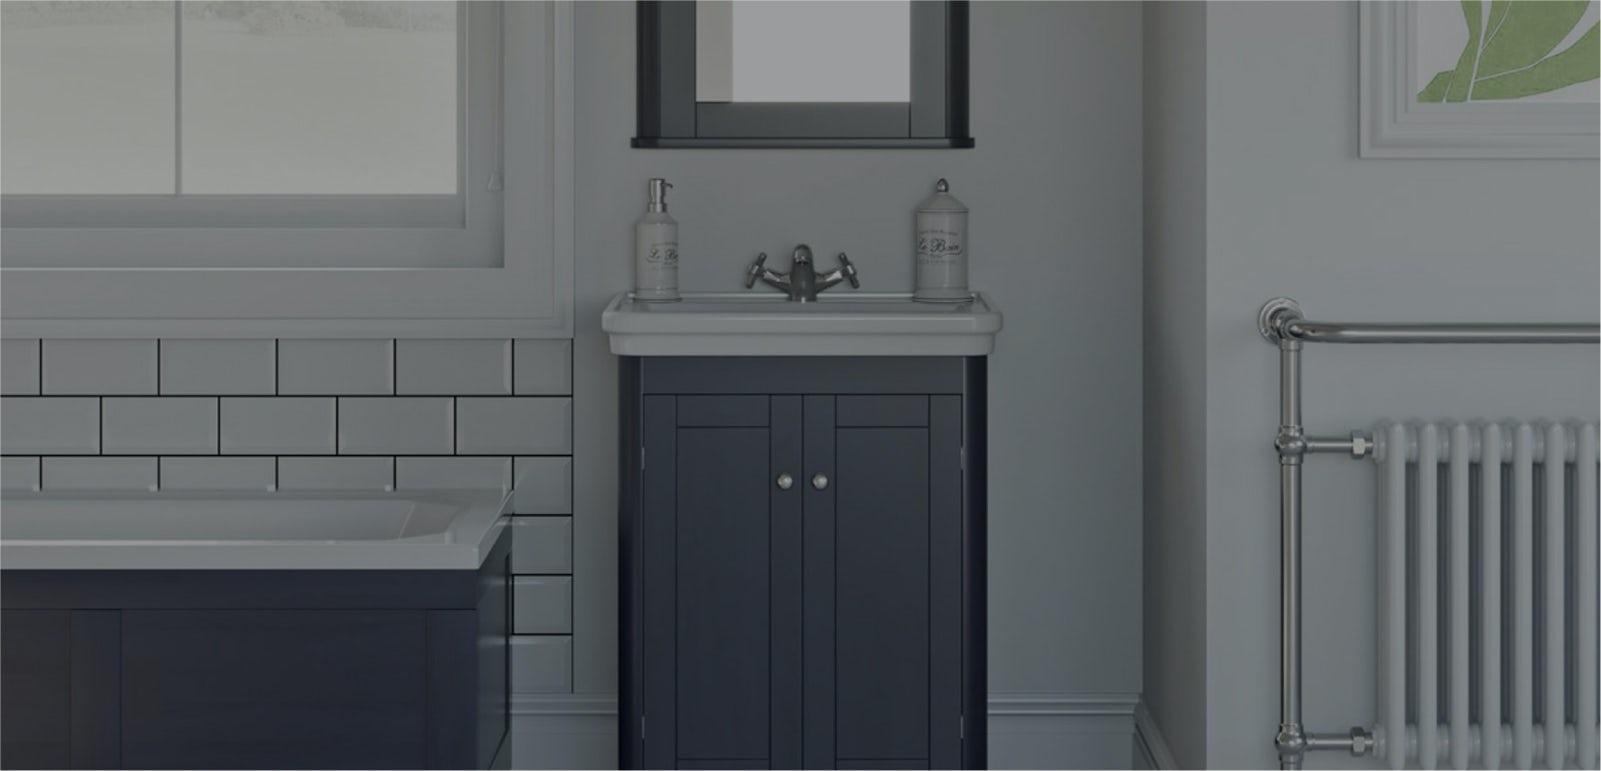 Stylist's Selection: Nicky's top bathroom picks for November